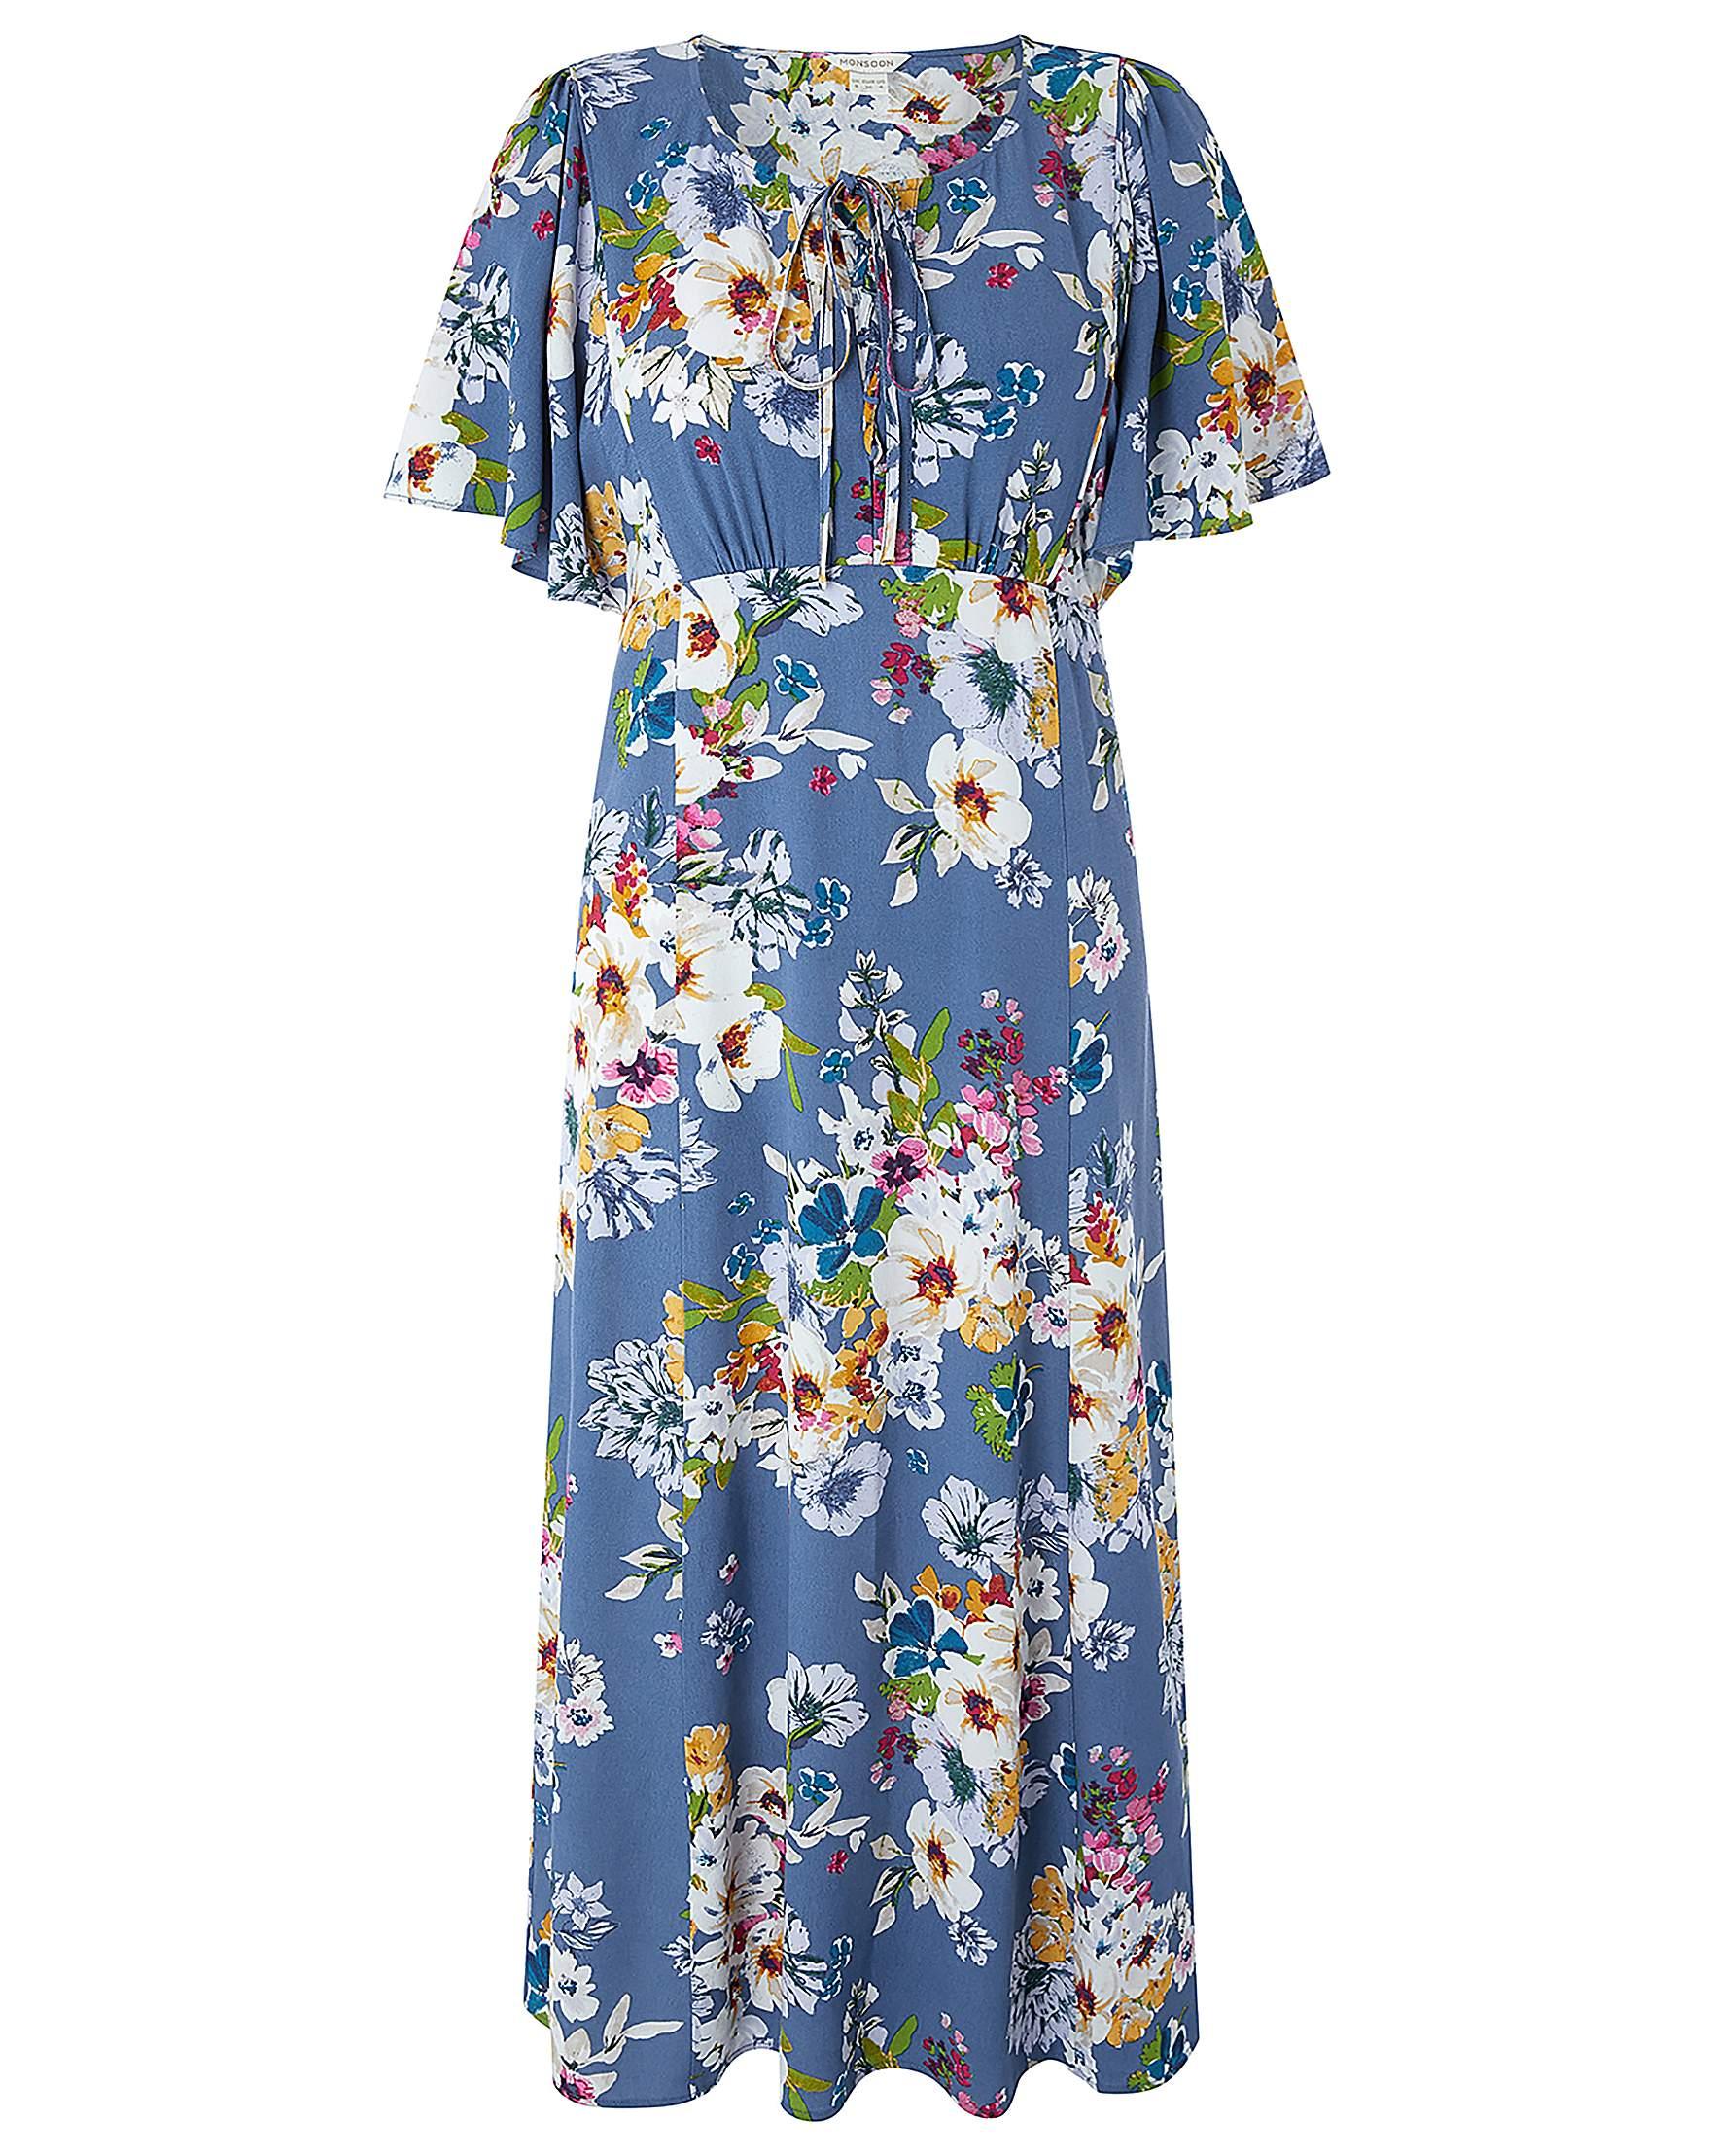 Monsoon Lori Print Lace Up Midi Dress | Simply Be